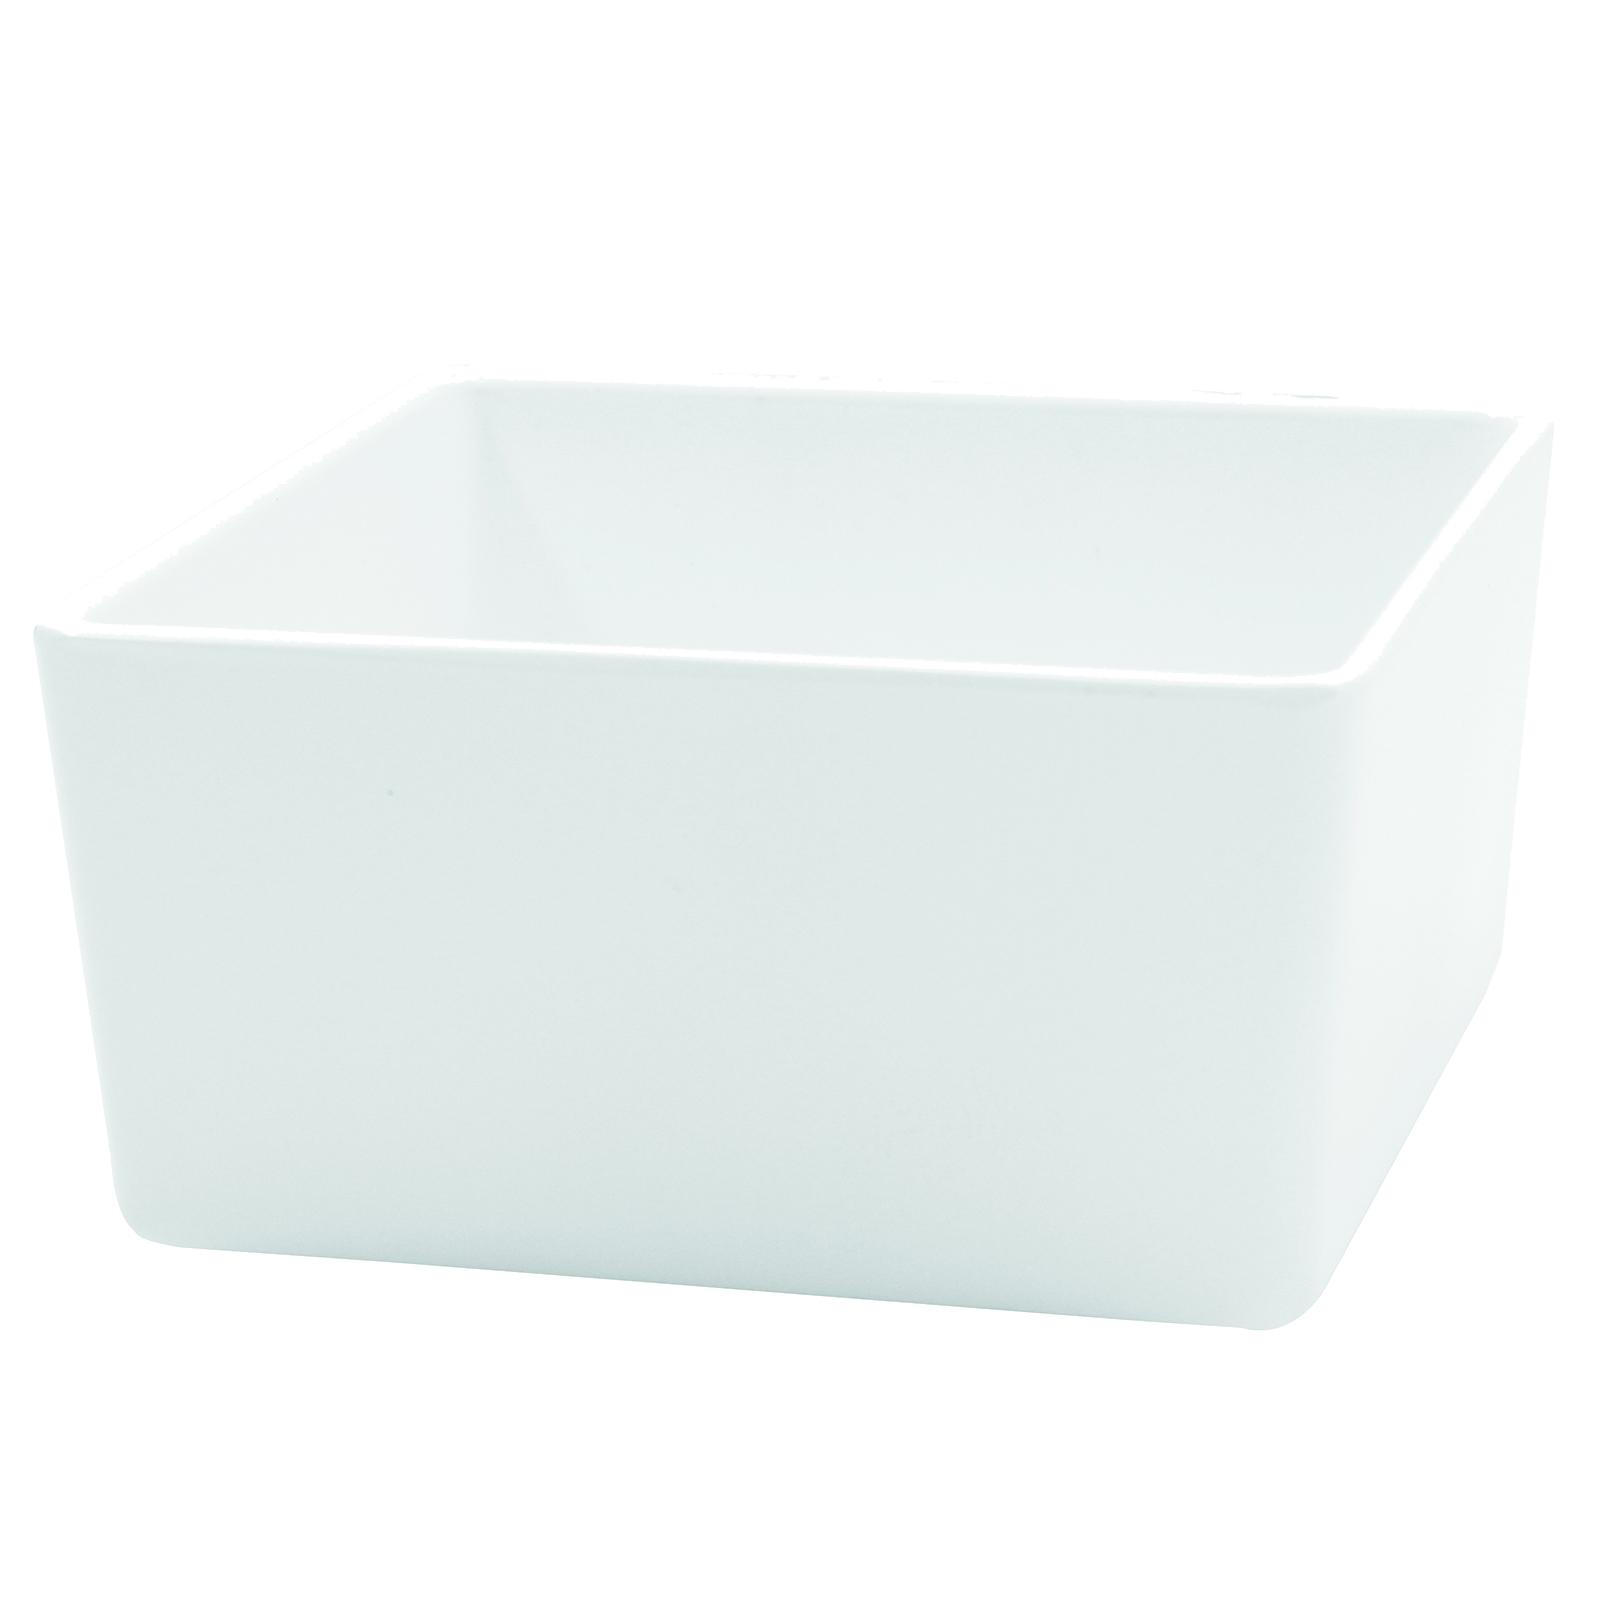 TableCraft Products M4025WH bowl, plastic,  1 - 2 qt (32 - 95 oz)